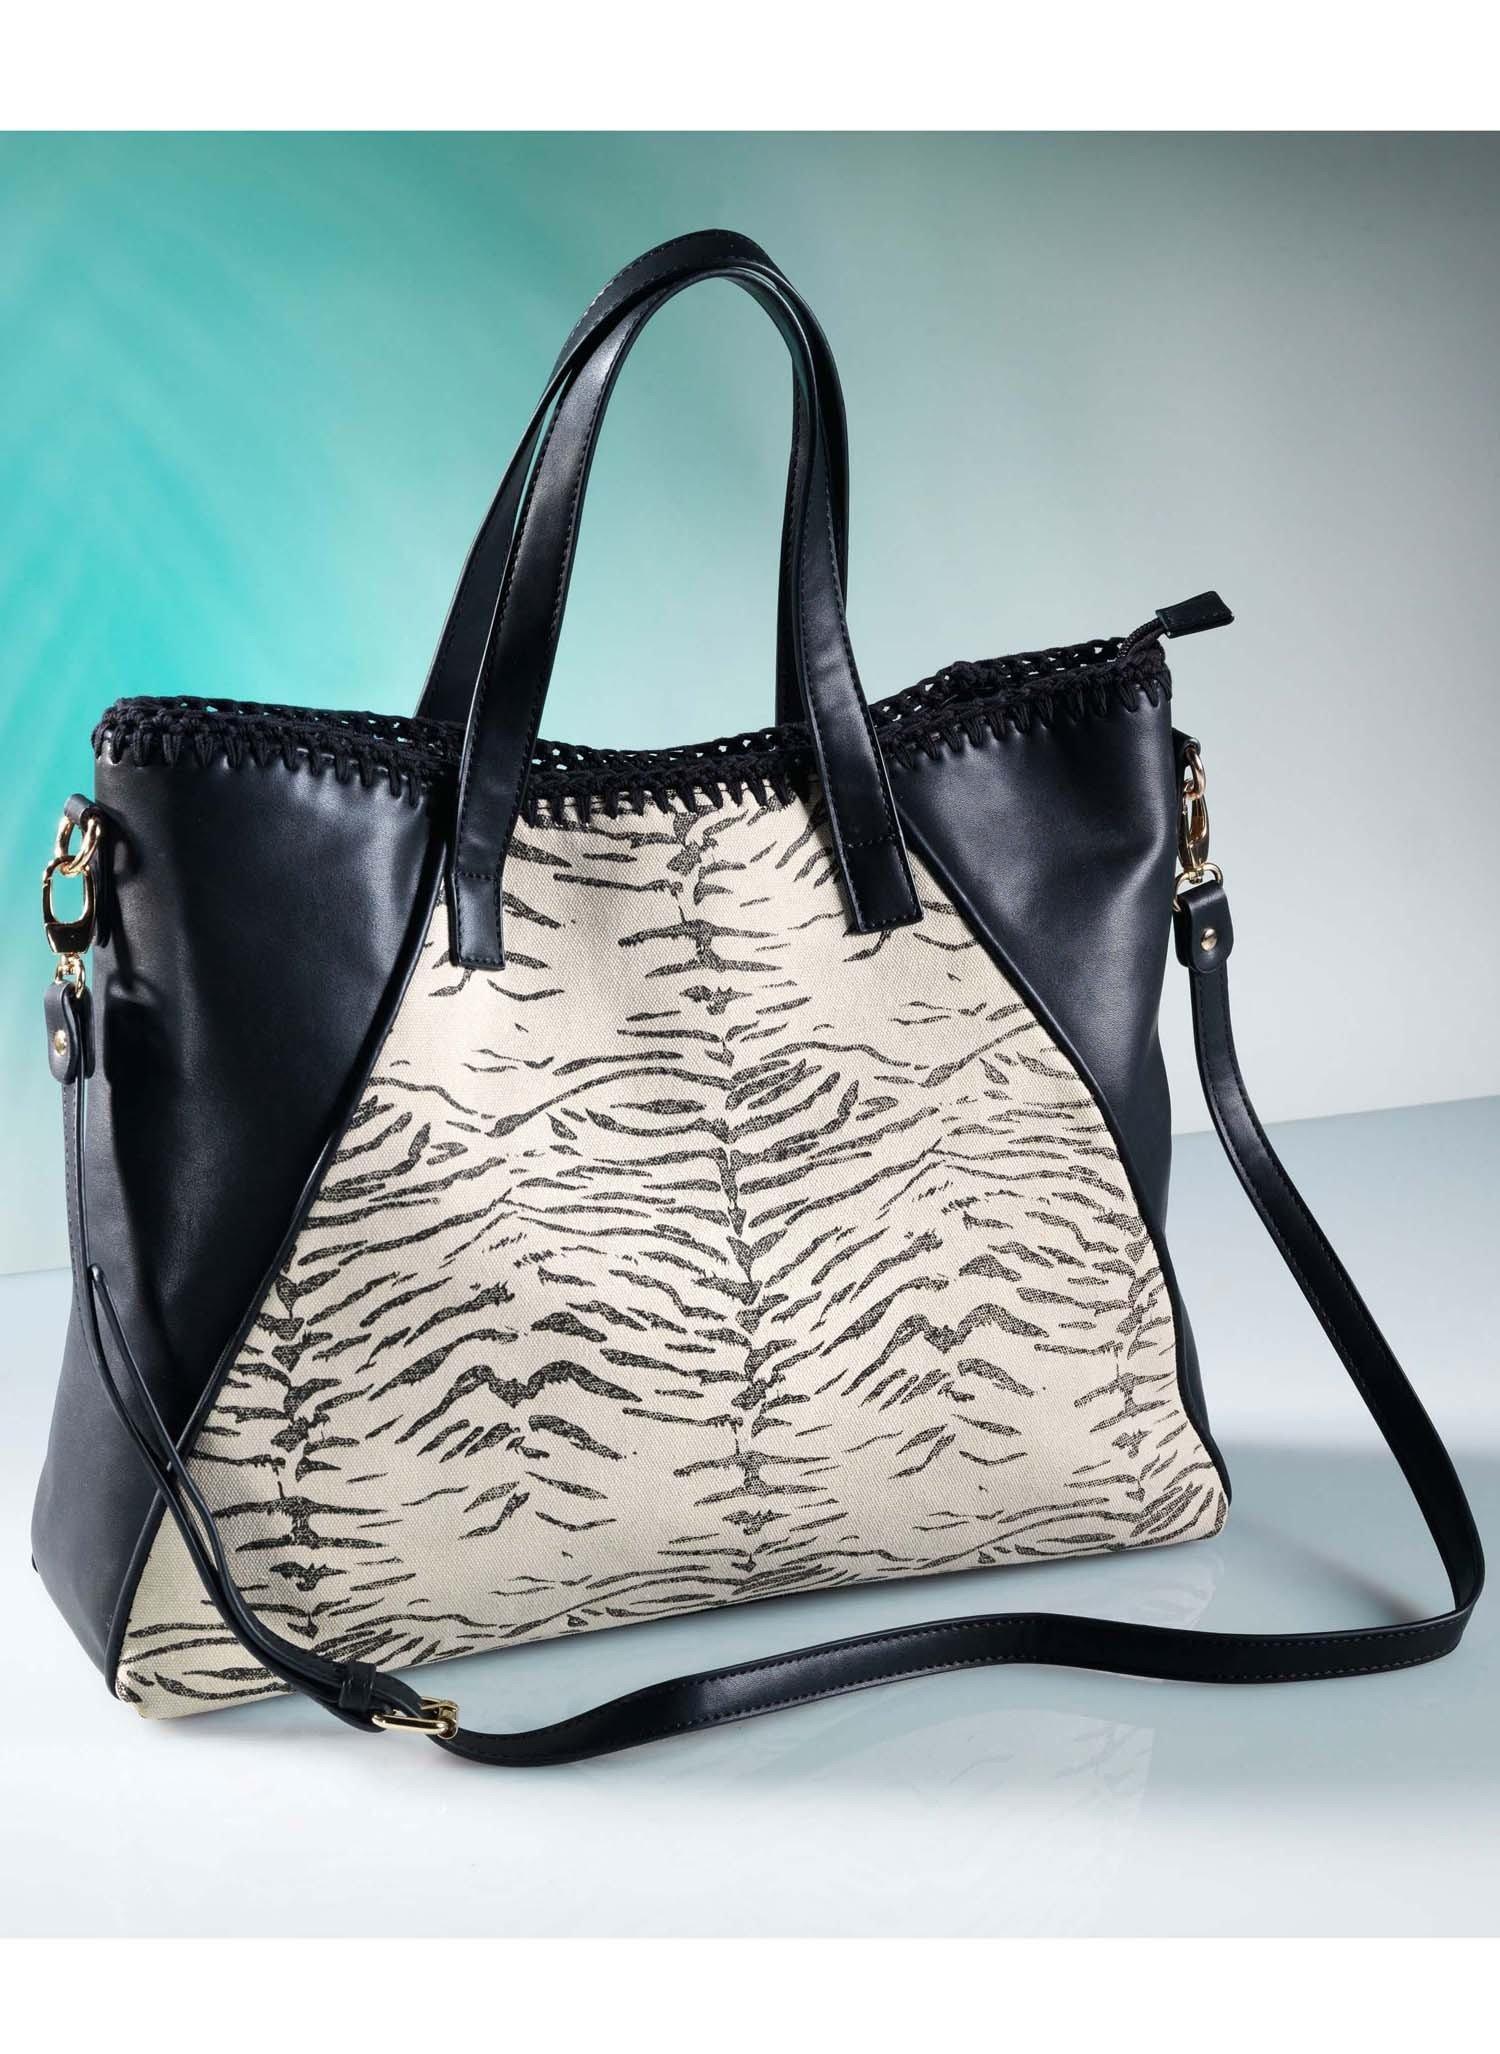 D-Handtasche,Animal,schw/natur